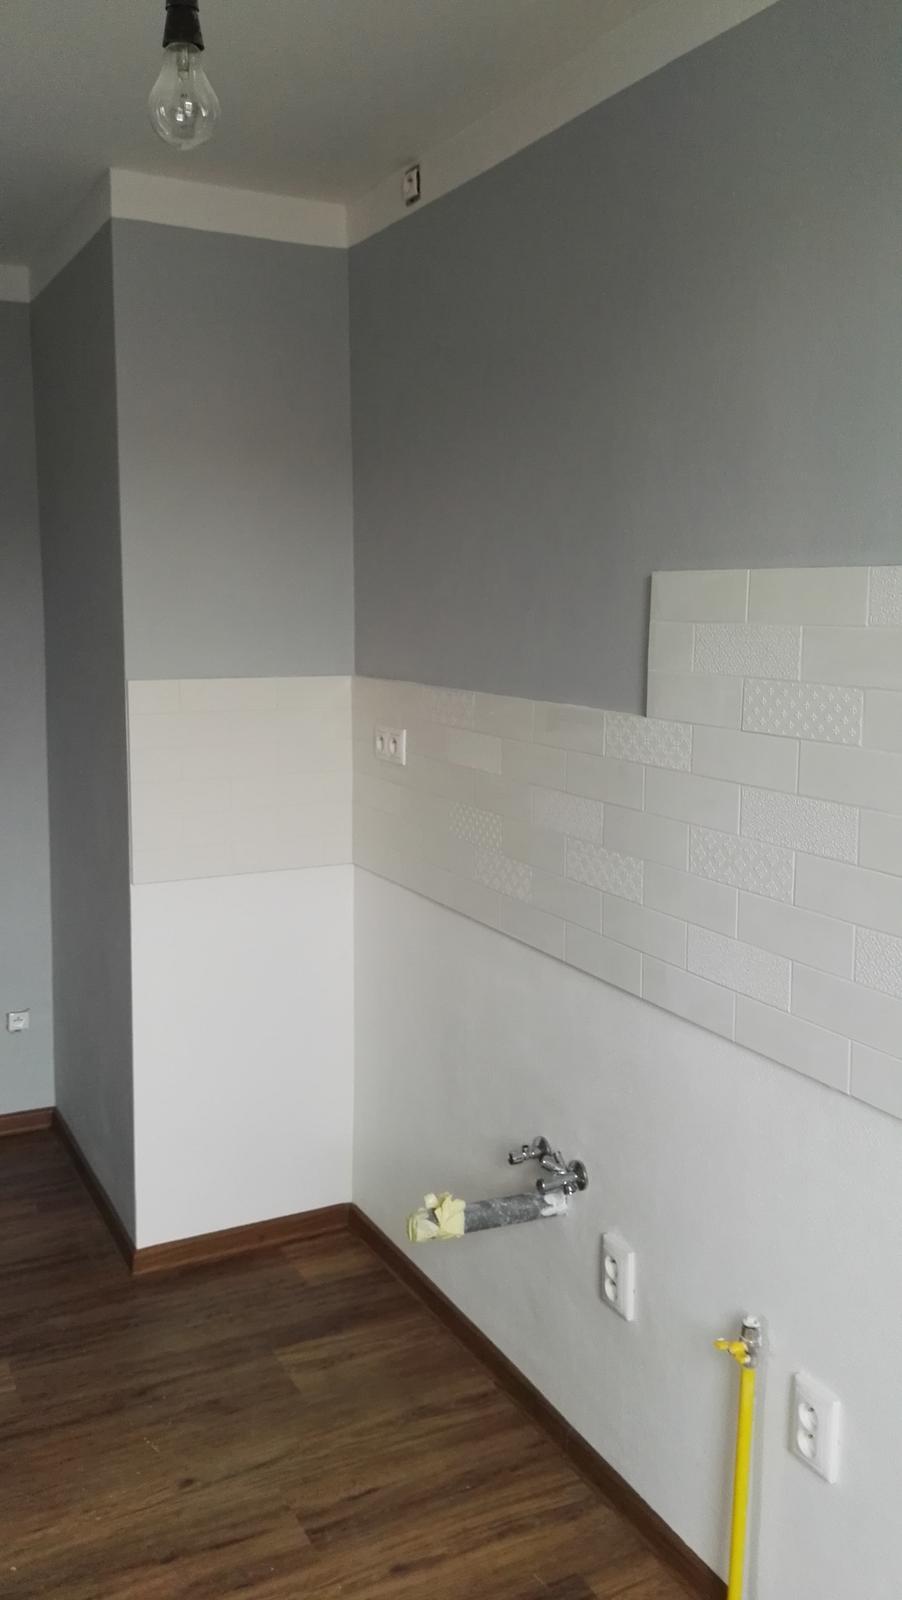 Projekt: Nové bývanie ... - Kuchyňa